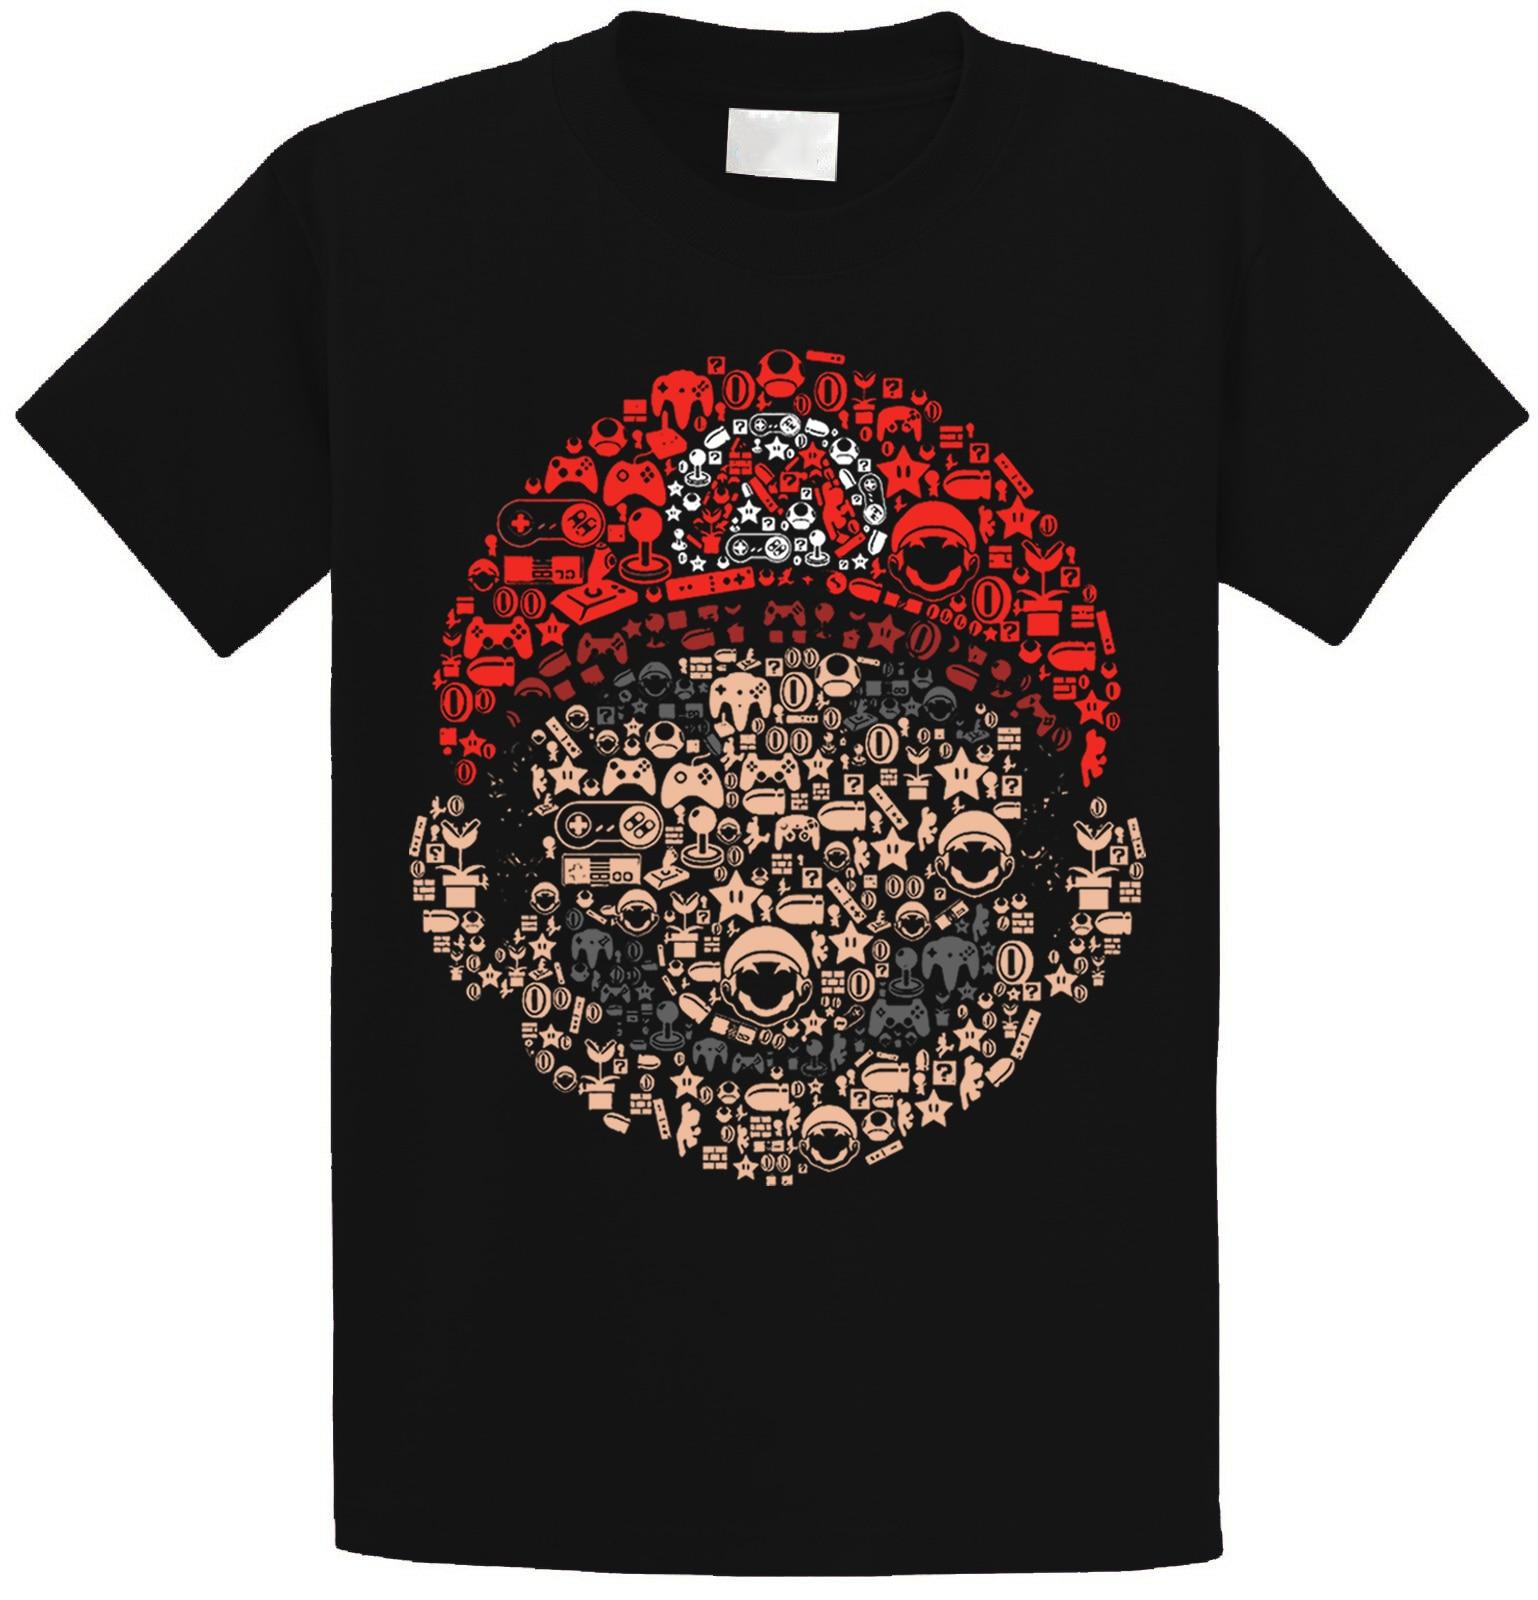 Super Mario Bros Mashup T Shirt Top Mushroom Kingdom Luigi Nintendo Geek Italian Simple Splicing Tee Tops Harajuku